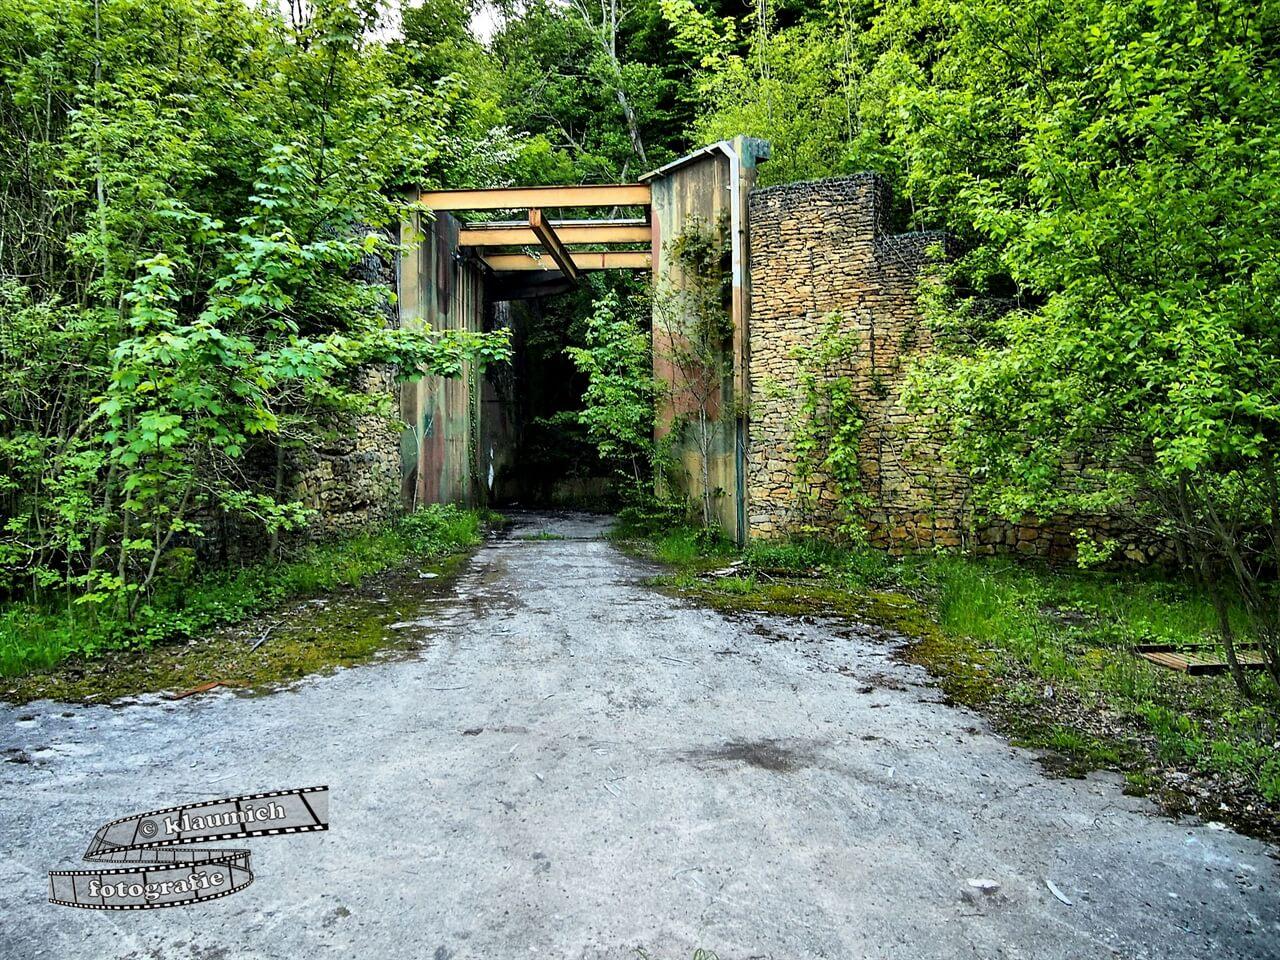 Entry Muniton